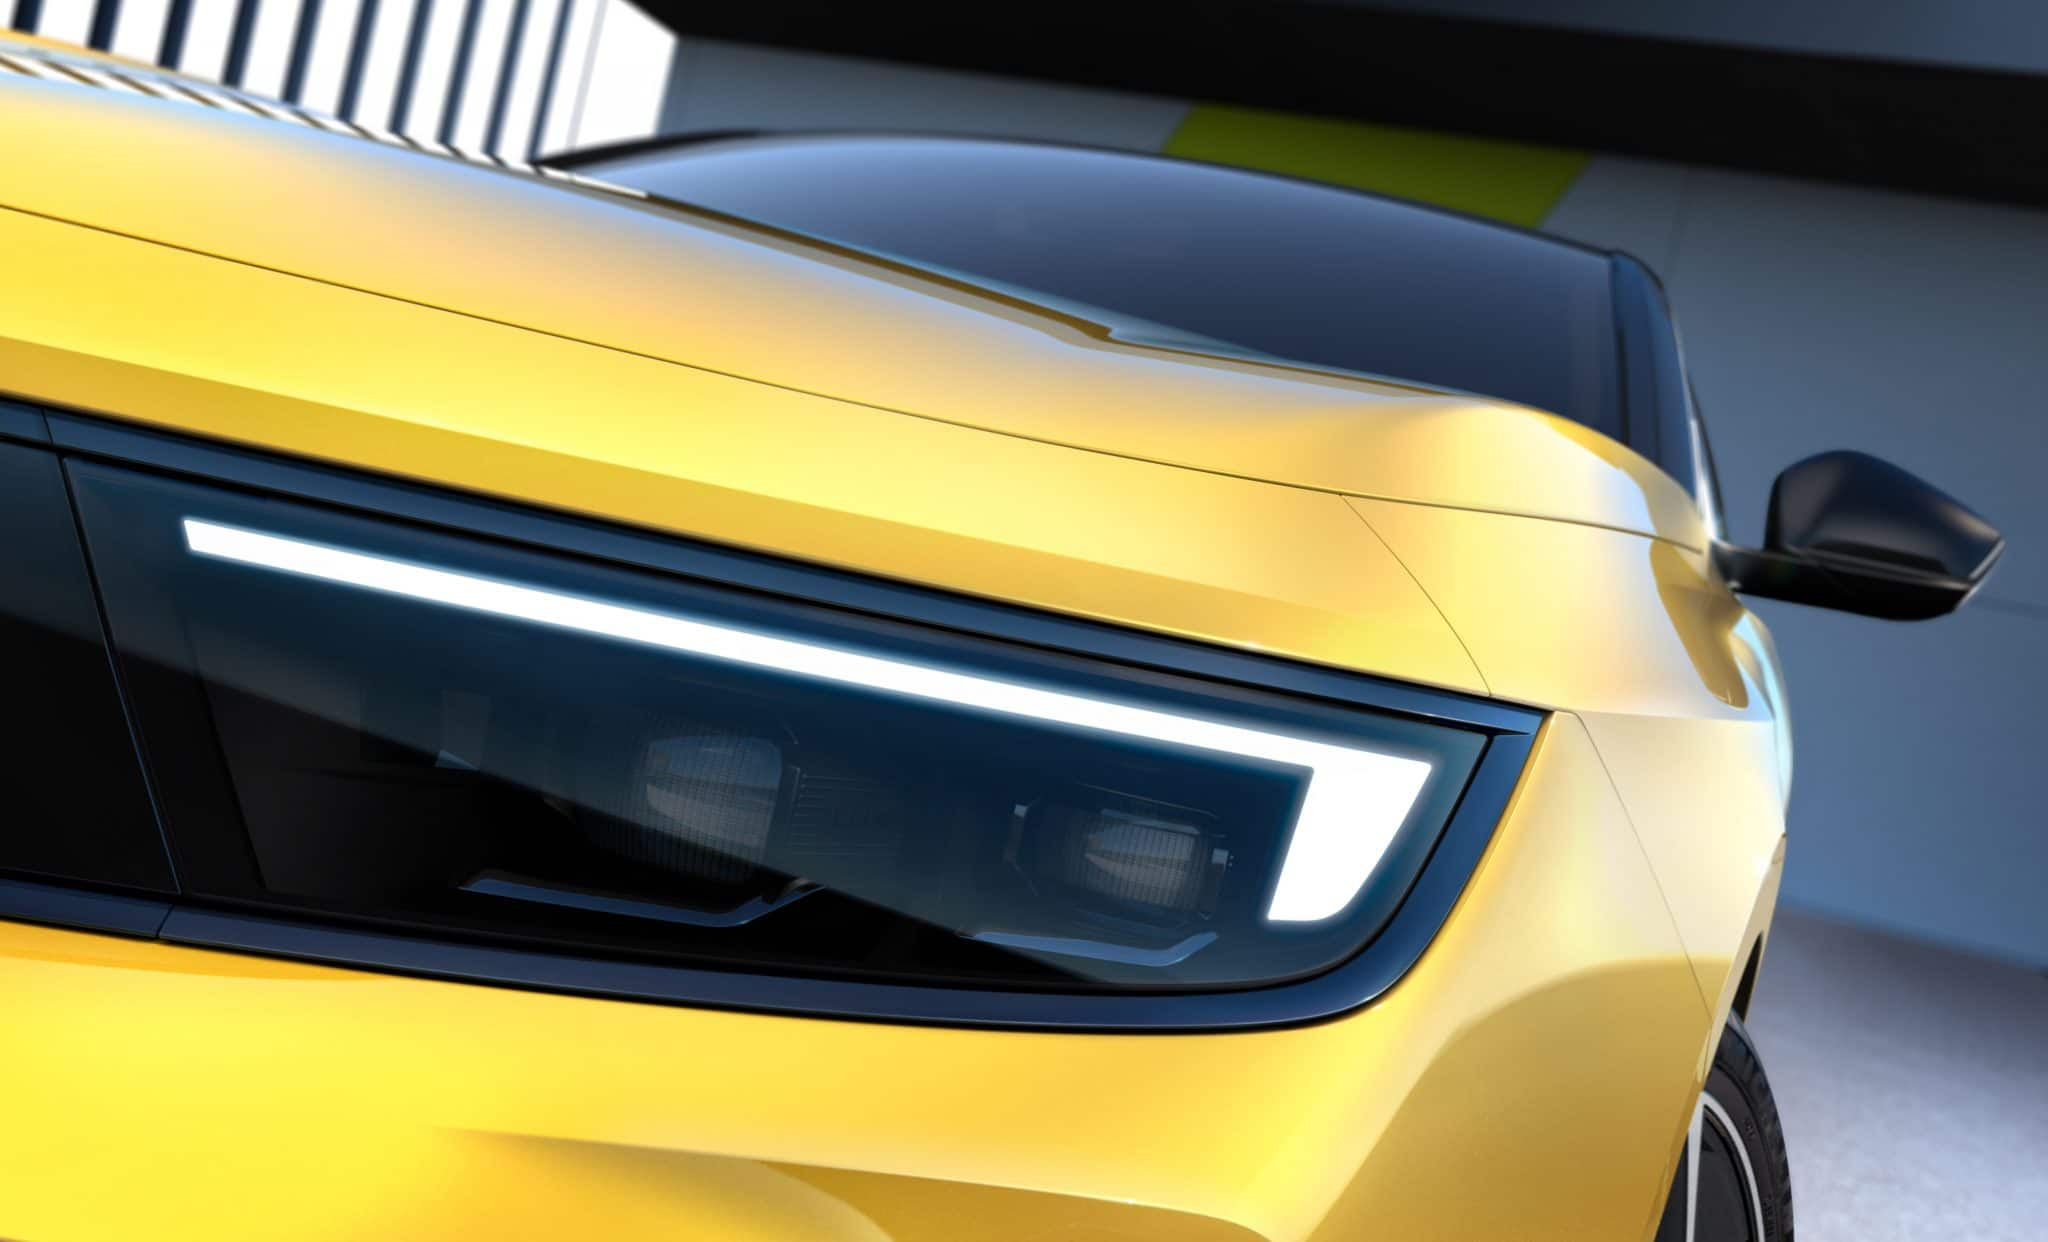 Future Opel Astra : les premières photos officielles